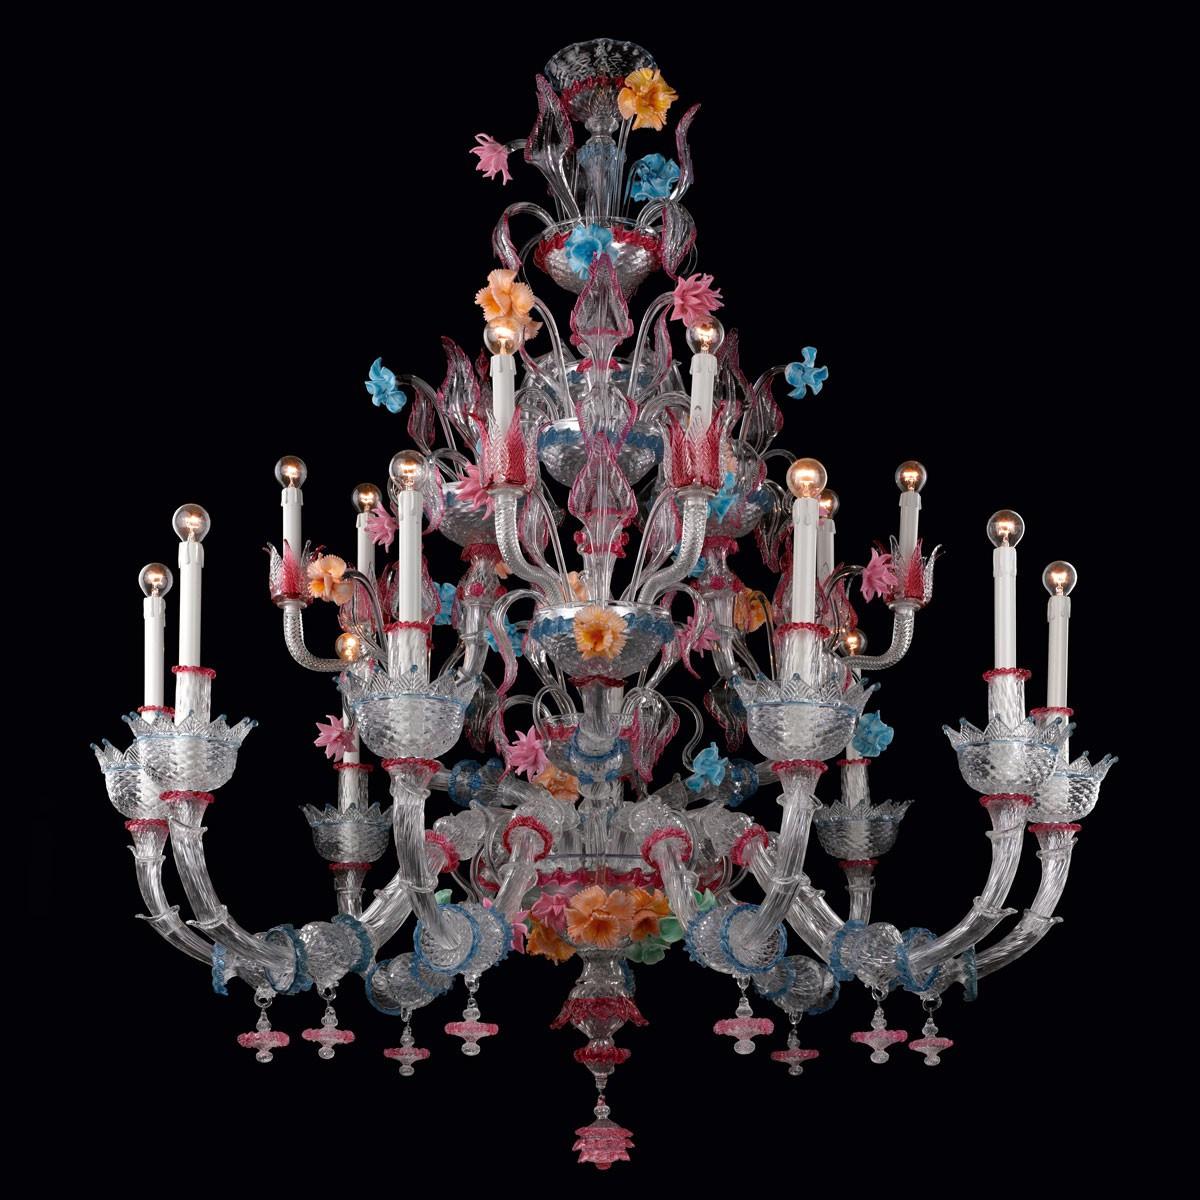 """Romantico"" Murano glass chandelier - 15 lights"